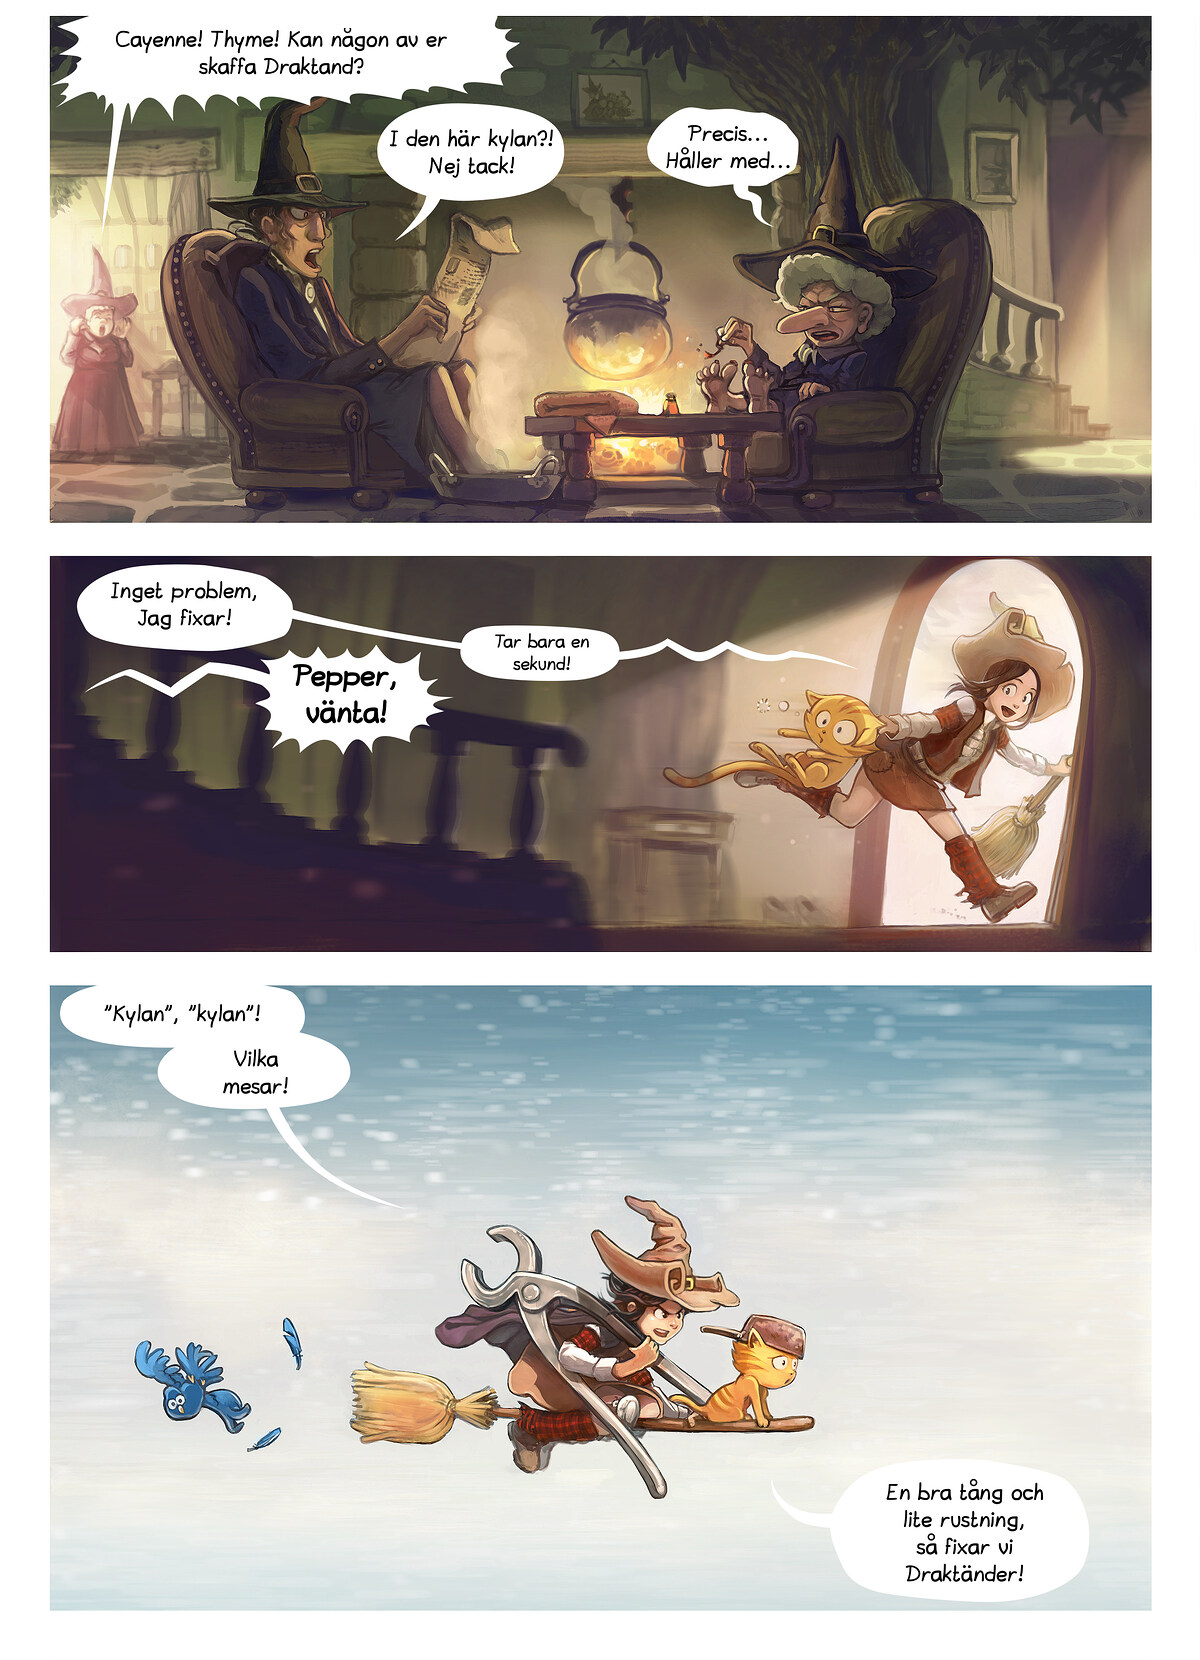 Episode 14: Draktanden, Page 2